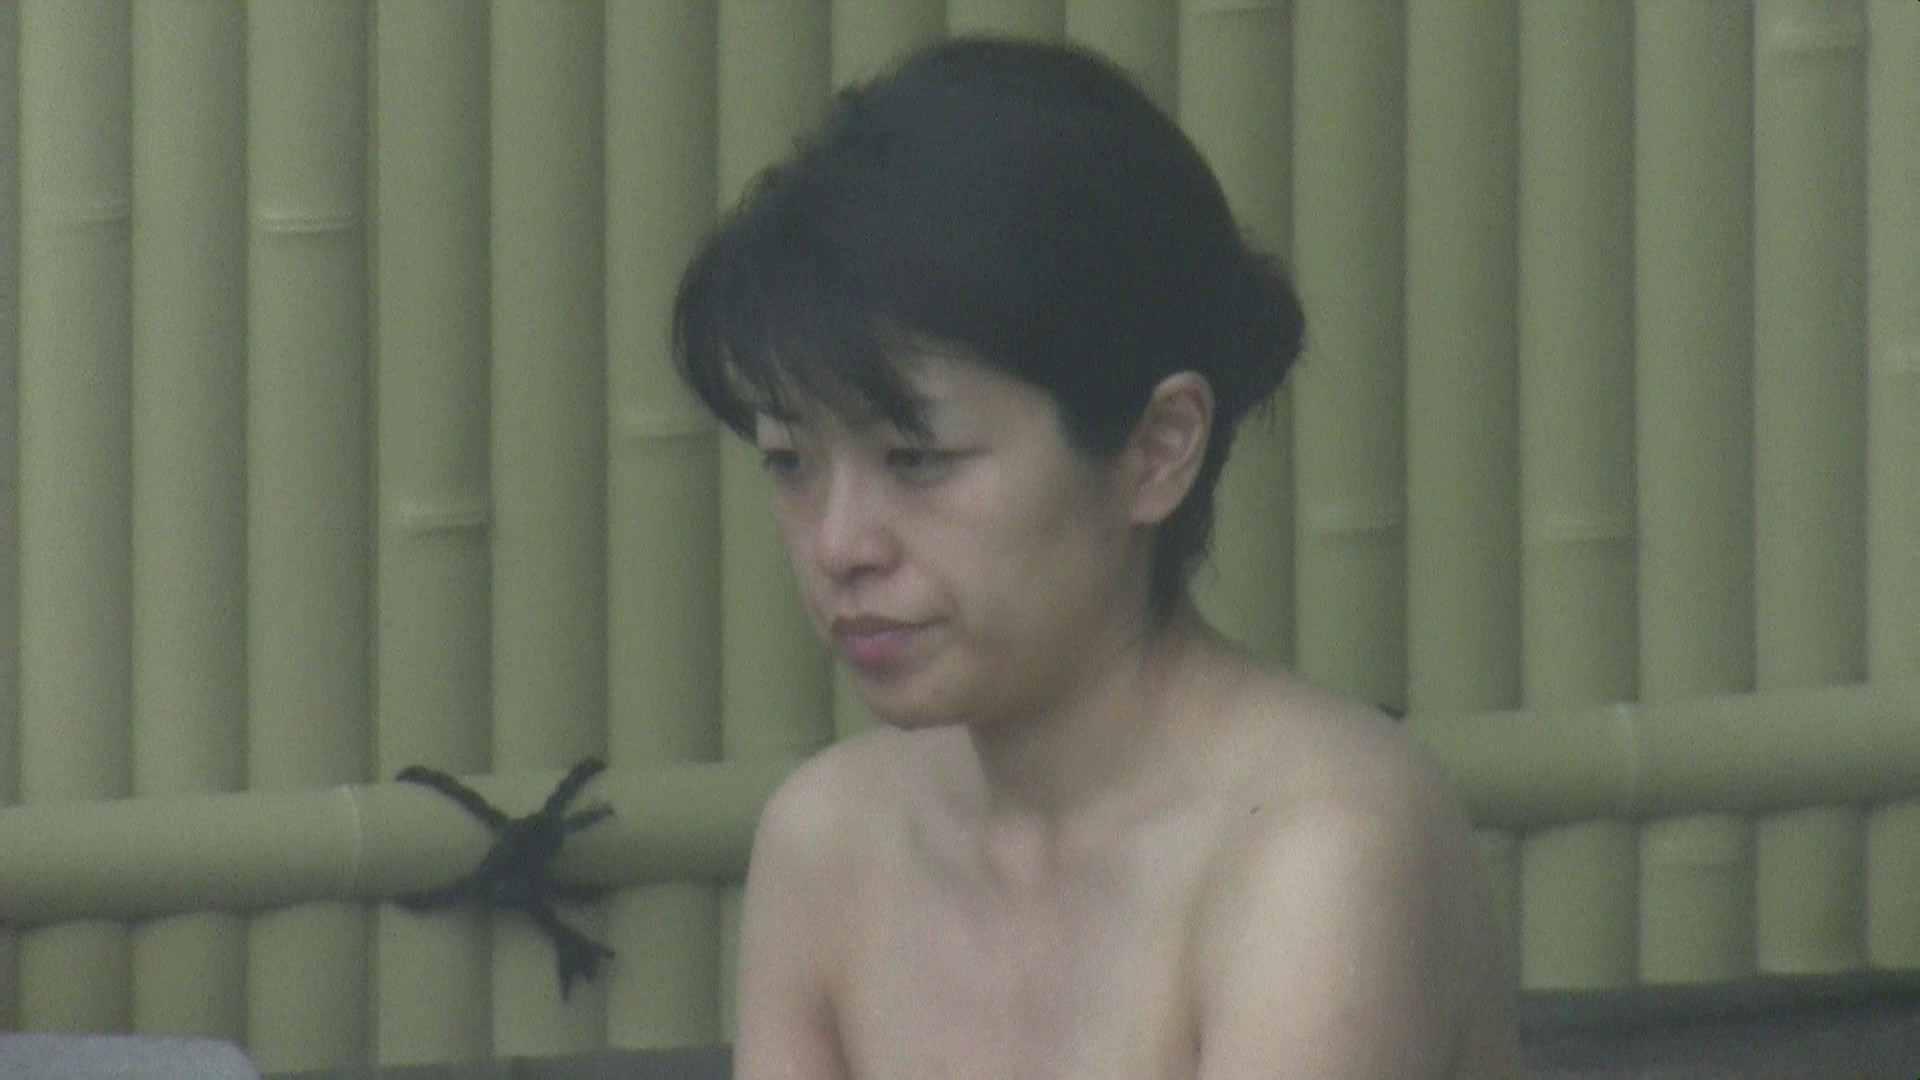 Aquaな露天風呂Vol.585 露天 アダルト動画キャプチャ 78PICs 29